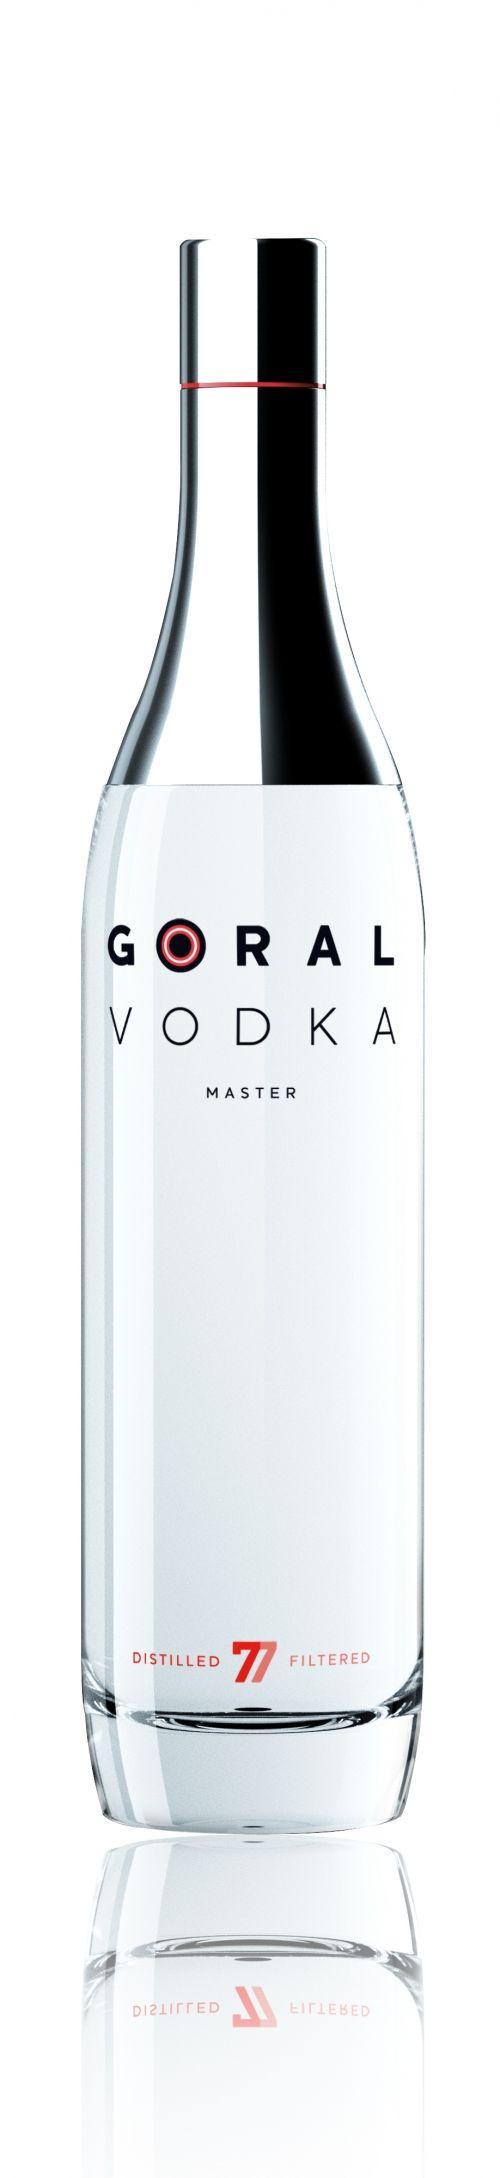 Goral Vodka MASTER Vodka from Slovakia seeking for distributors - Beverage Trade Network